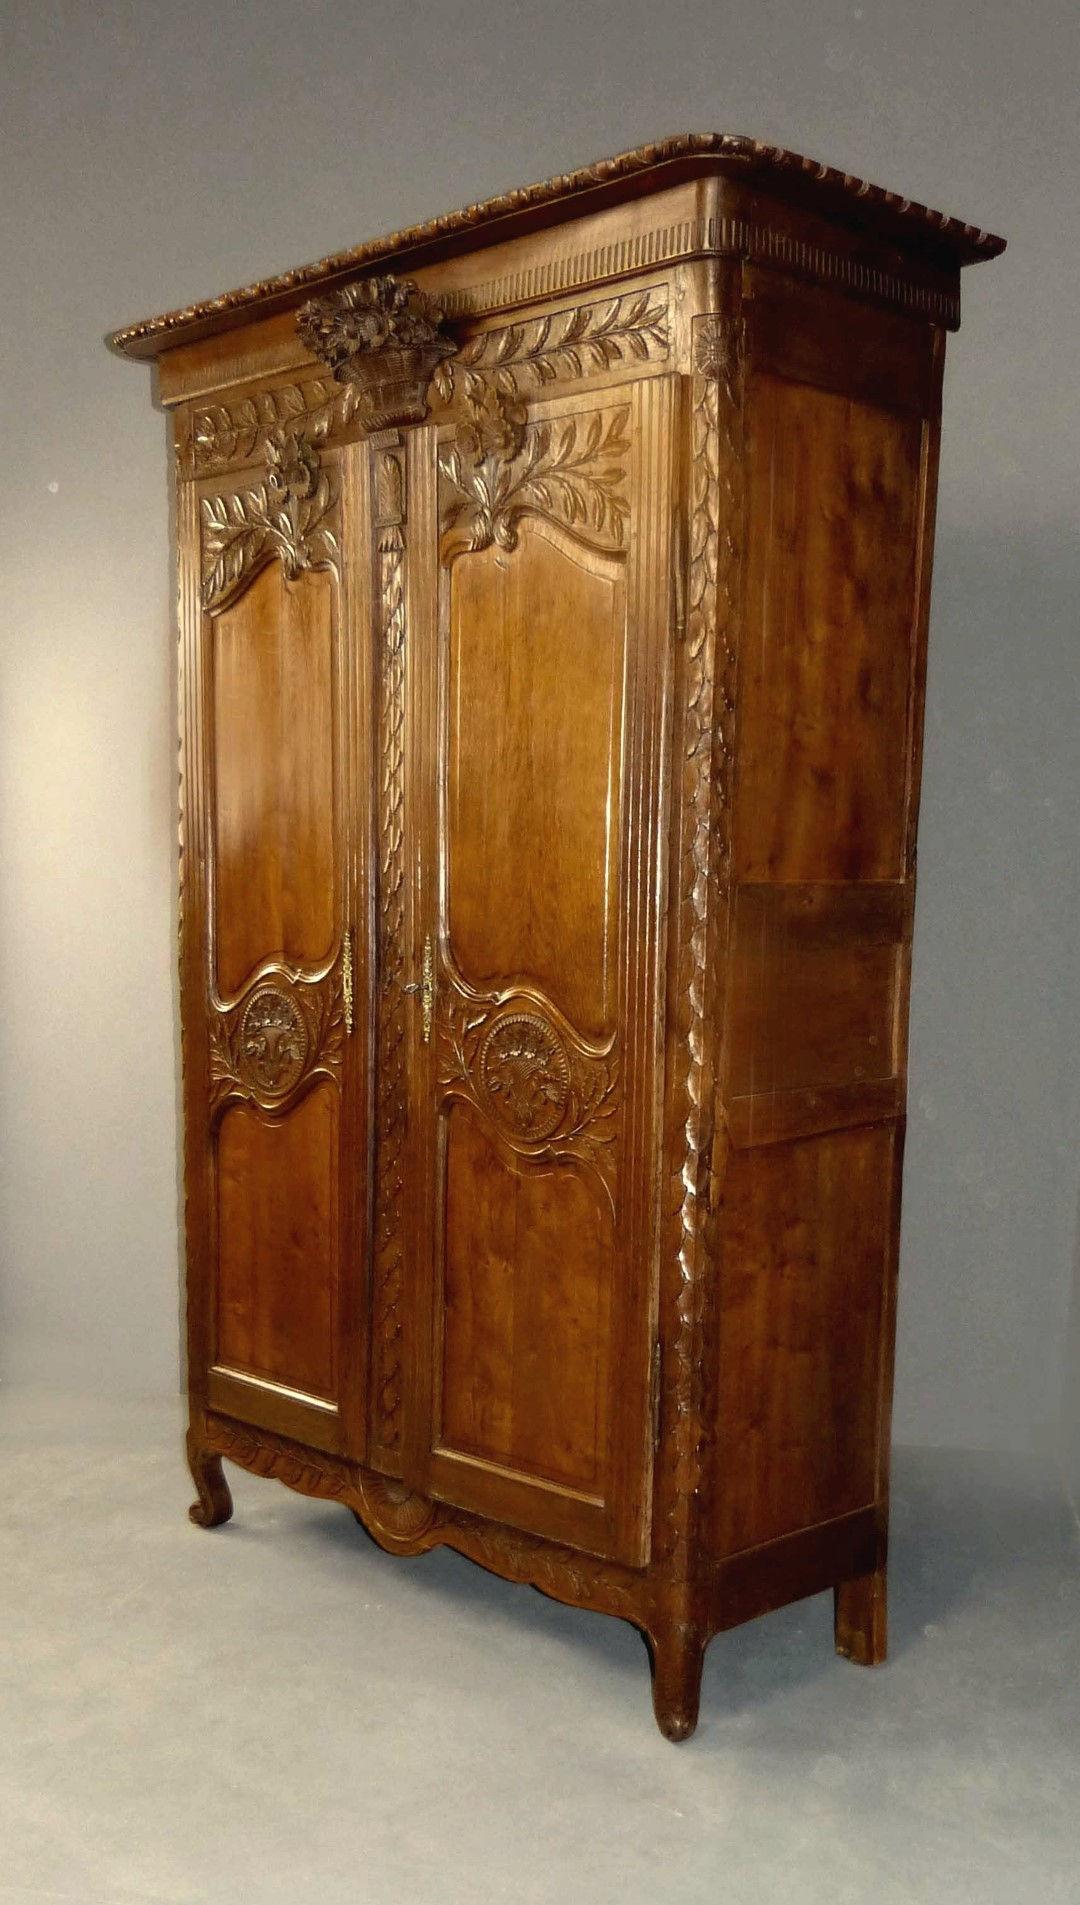 Armarios antiguos mallorquines : Muebles antiguos armarios mesas antiguas